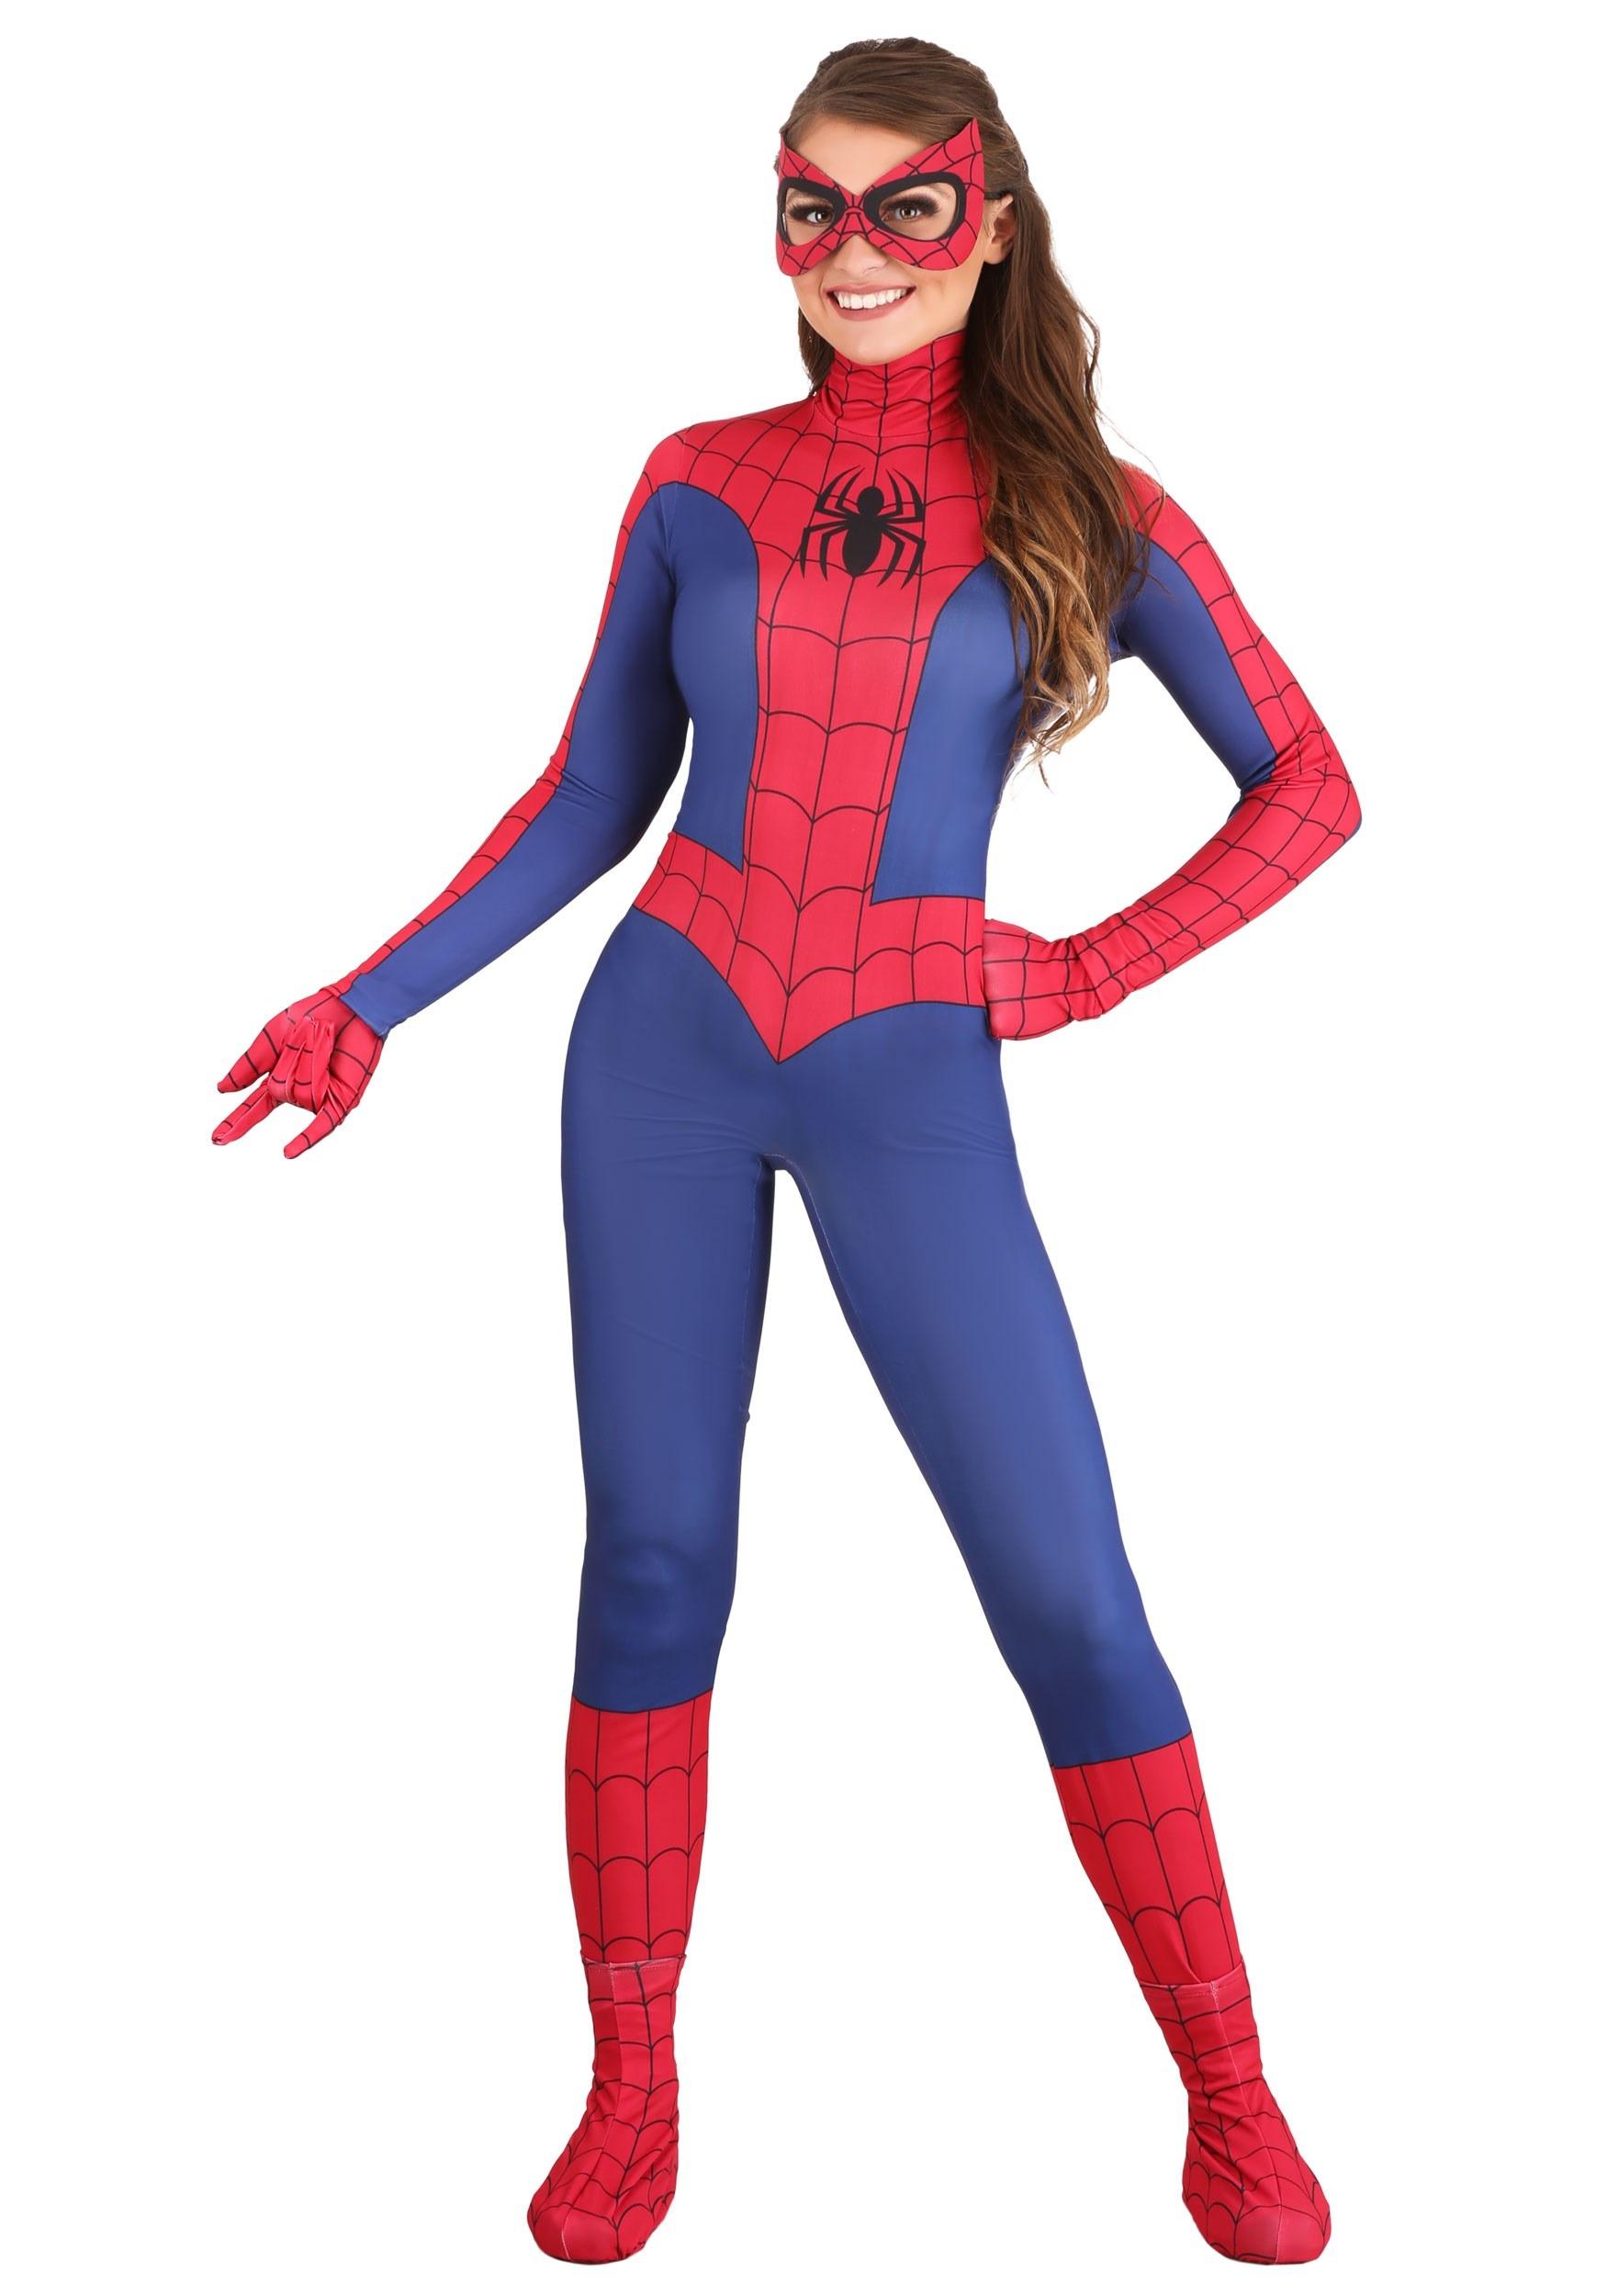 Spider-Man Women's Costume | Adult Superhero Costume